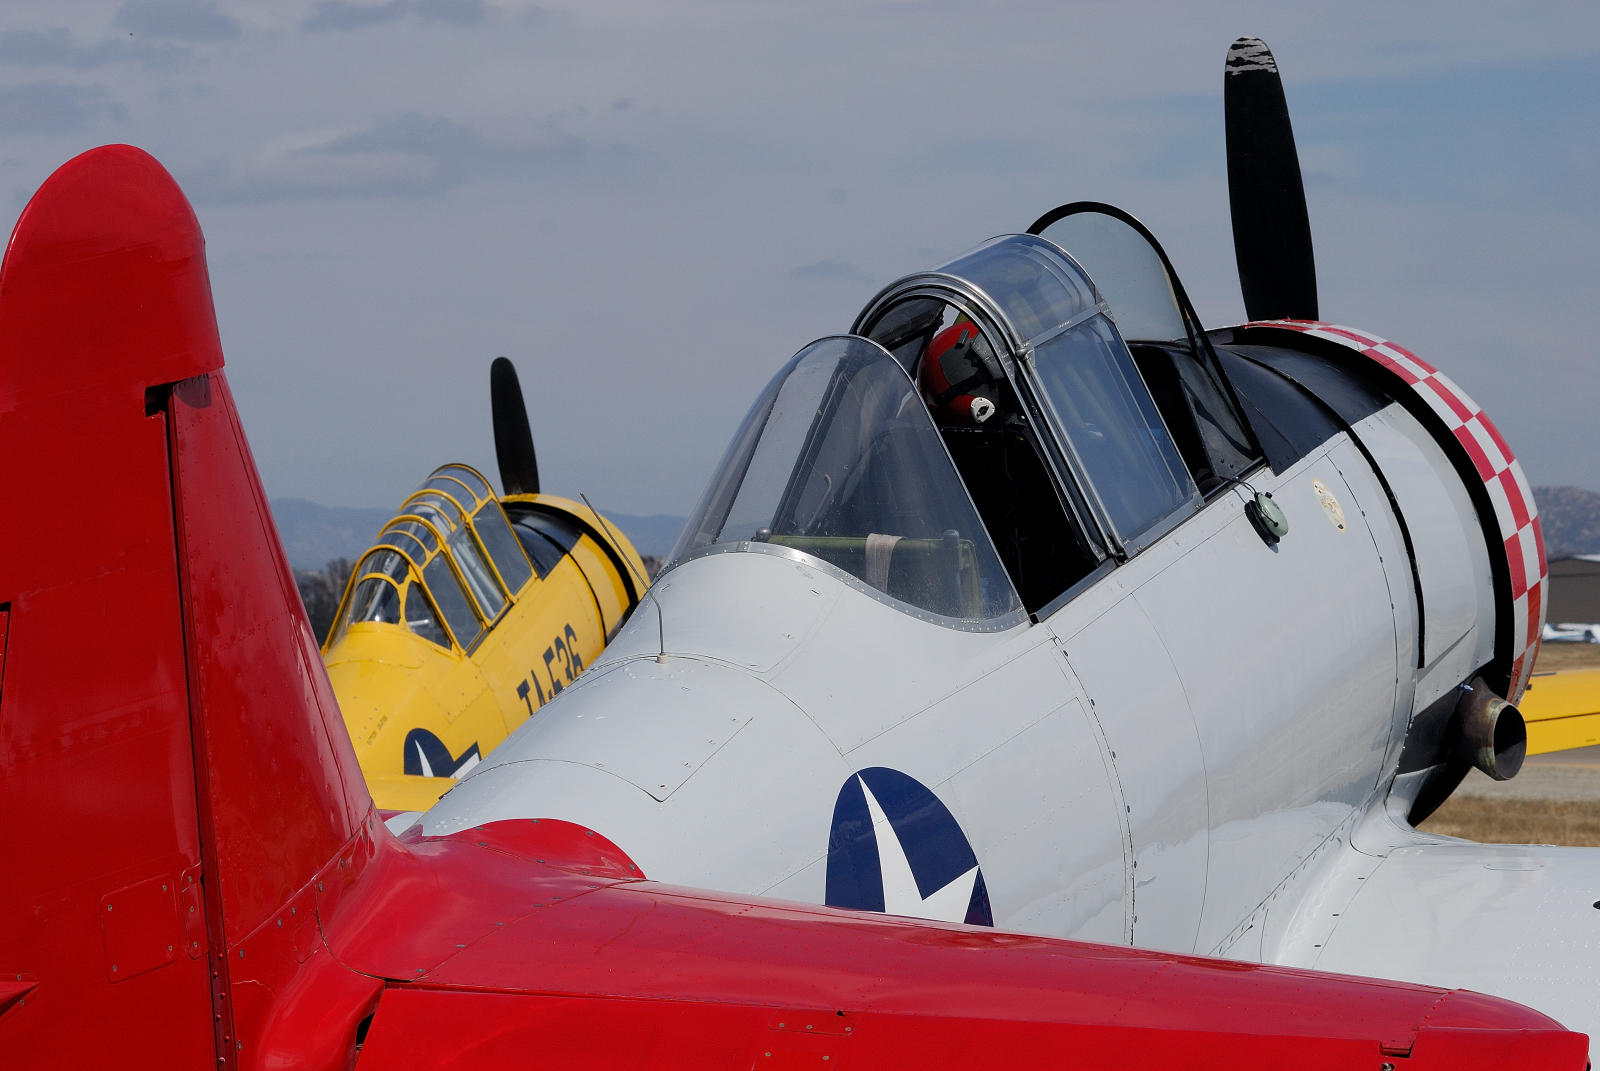 [22] 1953 Harvard MK IV  & 1941 T-6G Texan